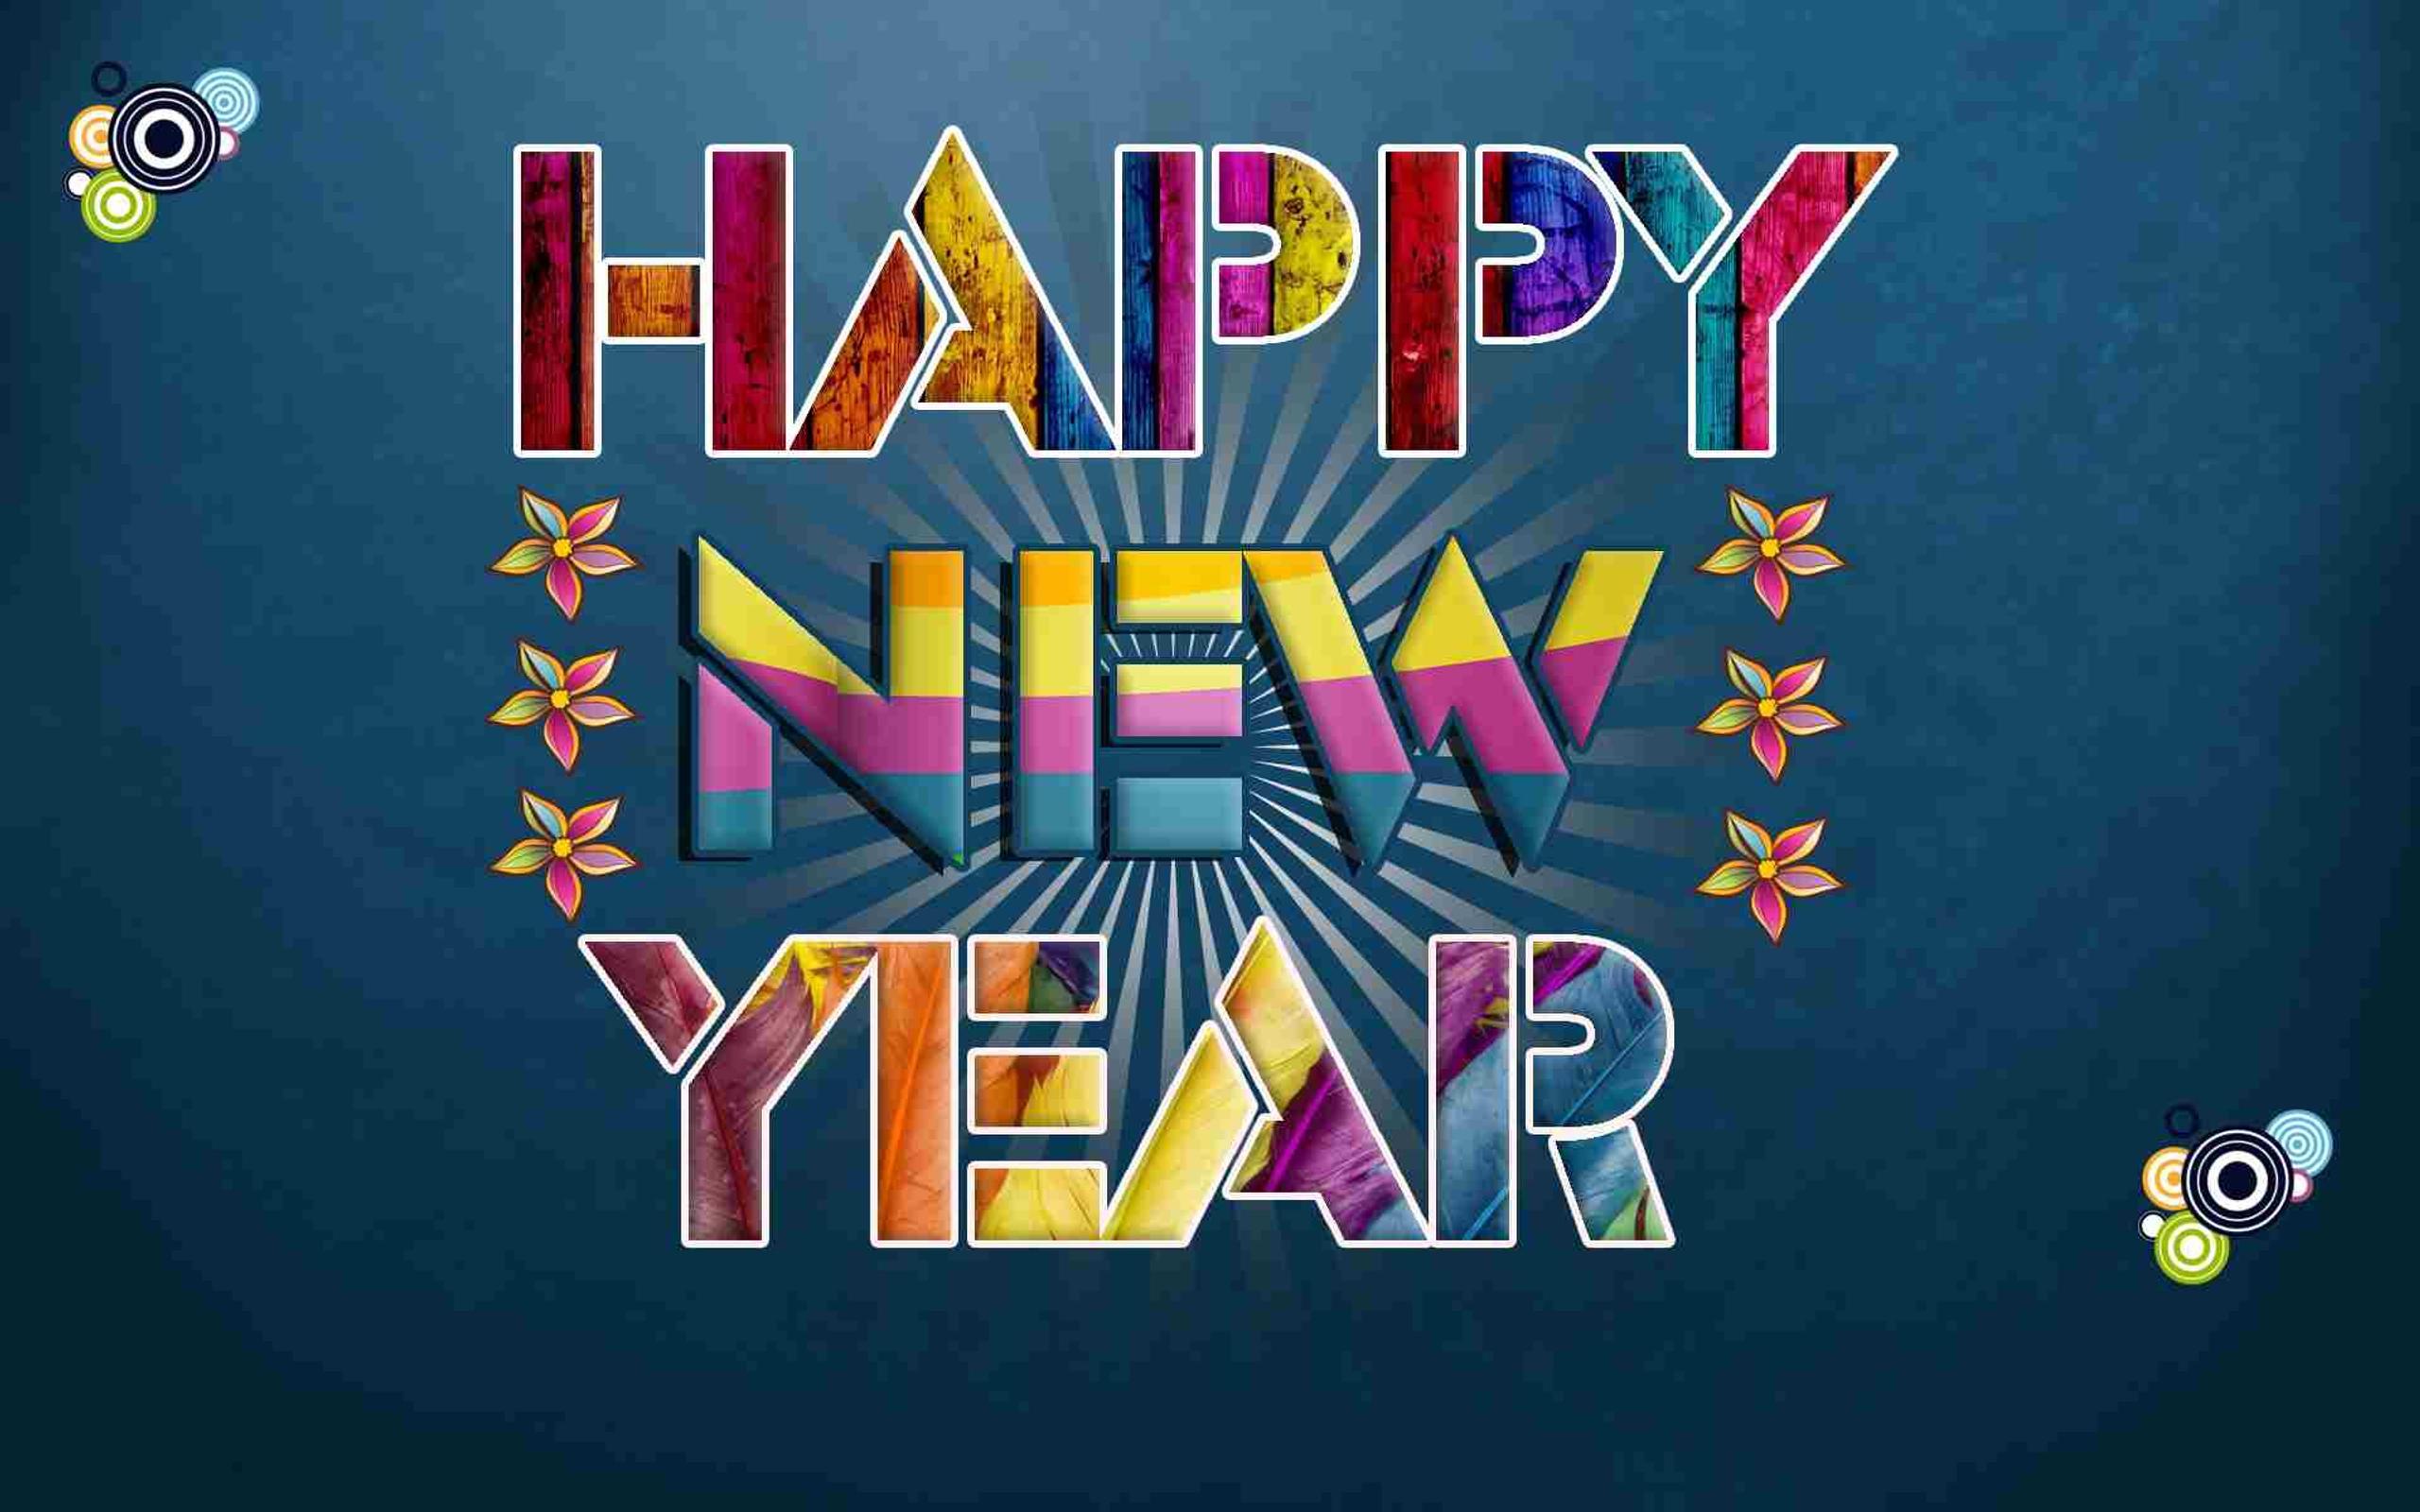 digital art colorgul message happy new year 2018 wallpaper download 2560x1600